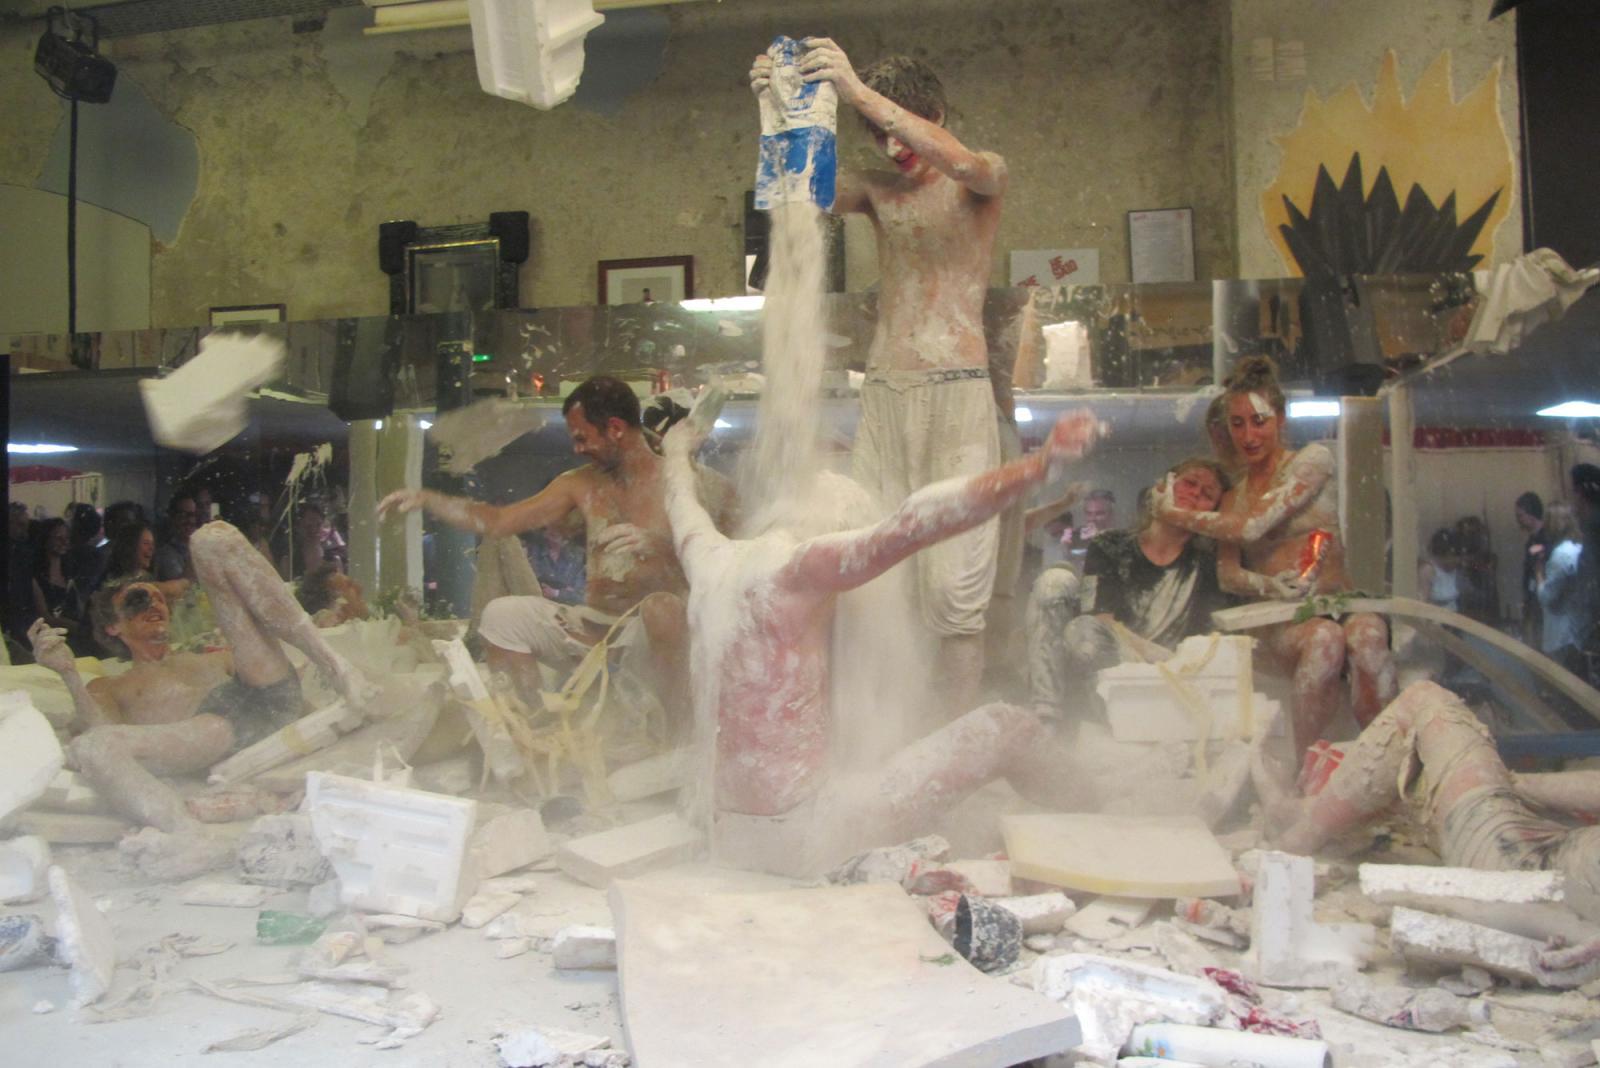 Gelitin Performance/The Guild of Giving /atCabaret der Künstler – Zunfthaus  Voltaire